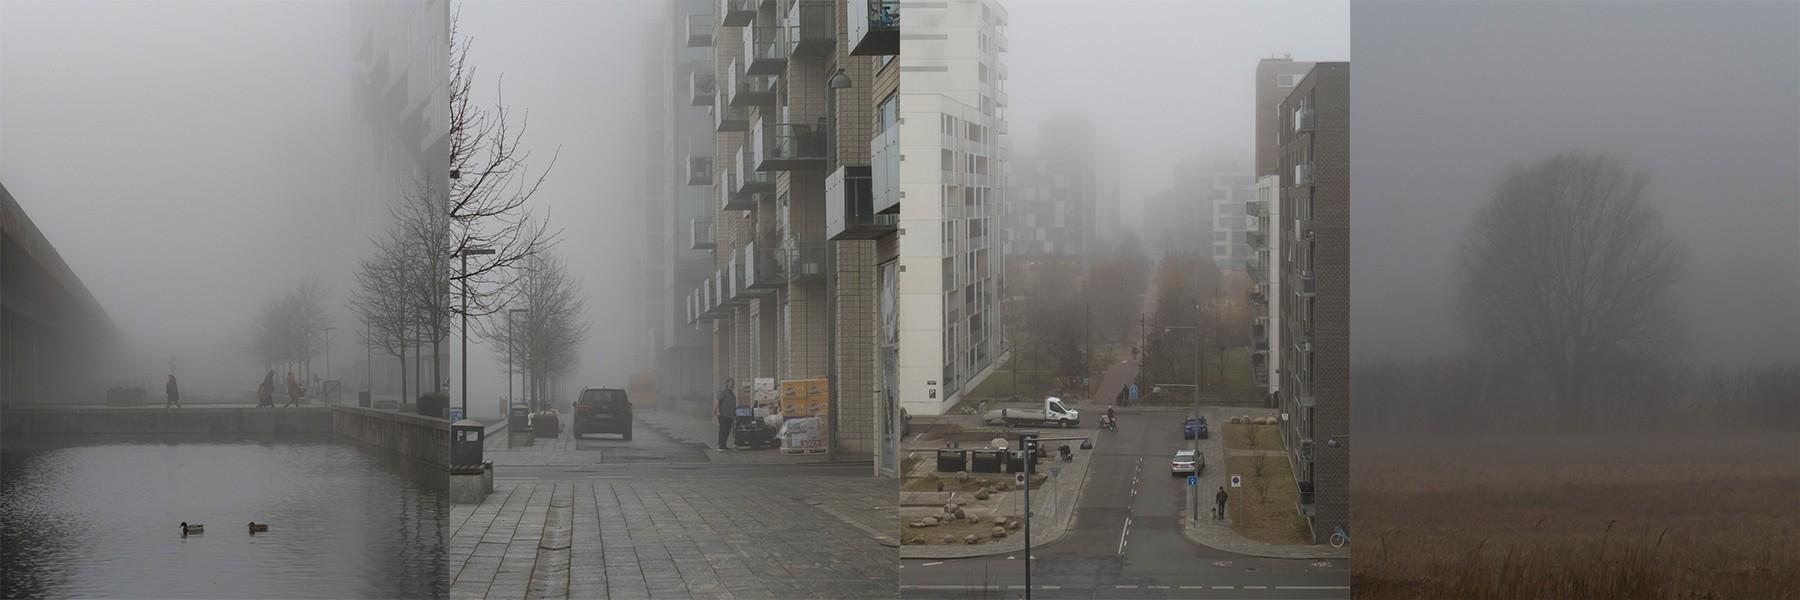 Tyk tåge i Ørestad